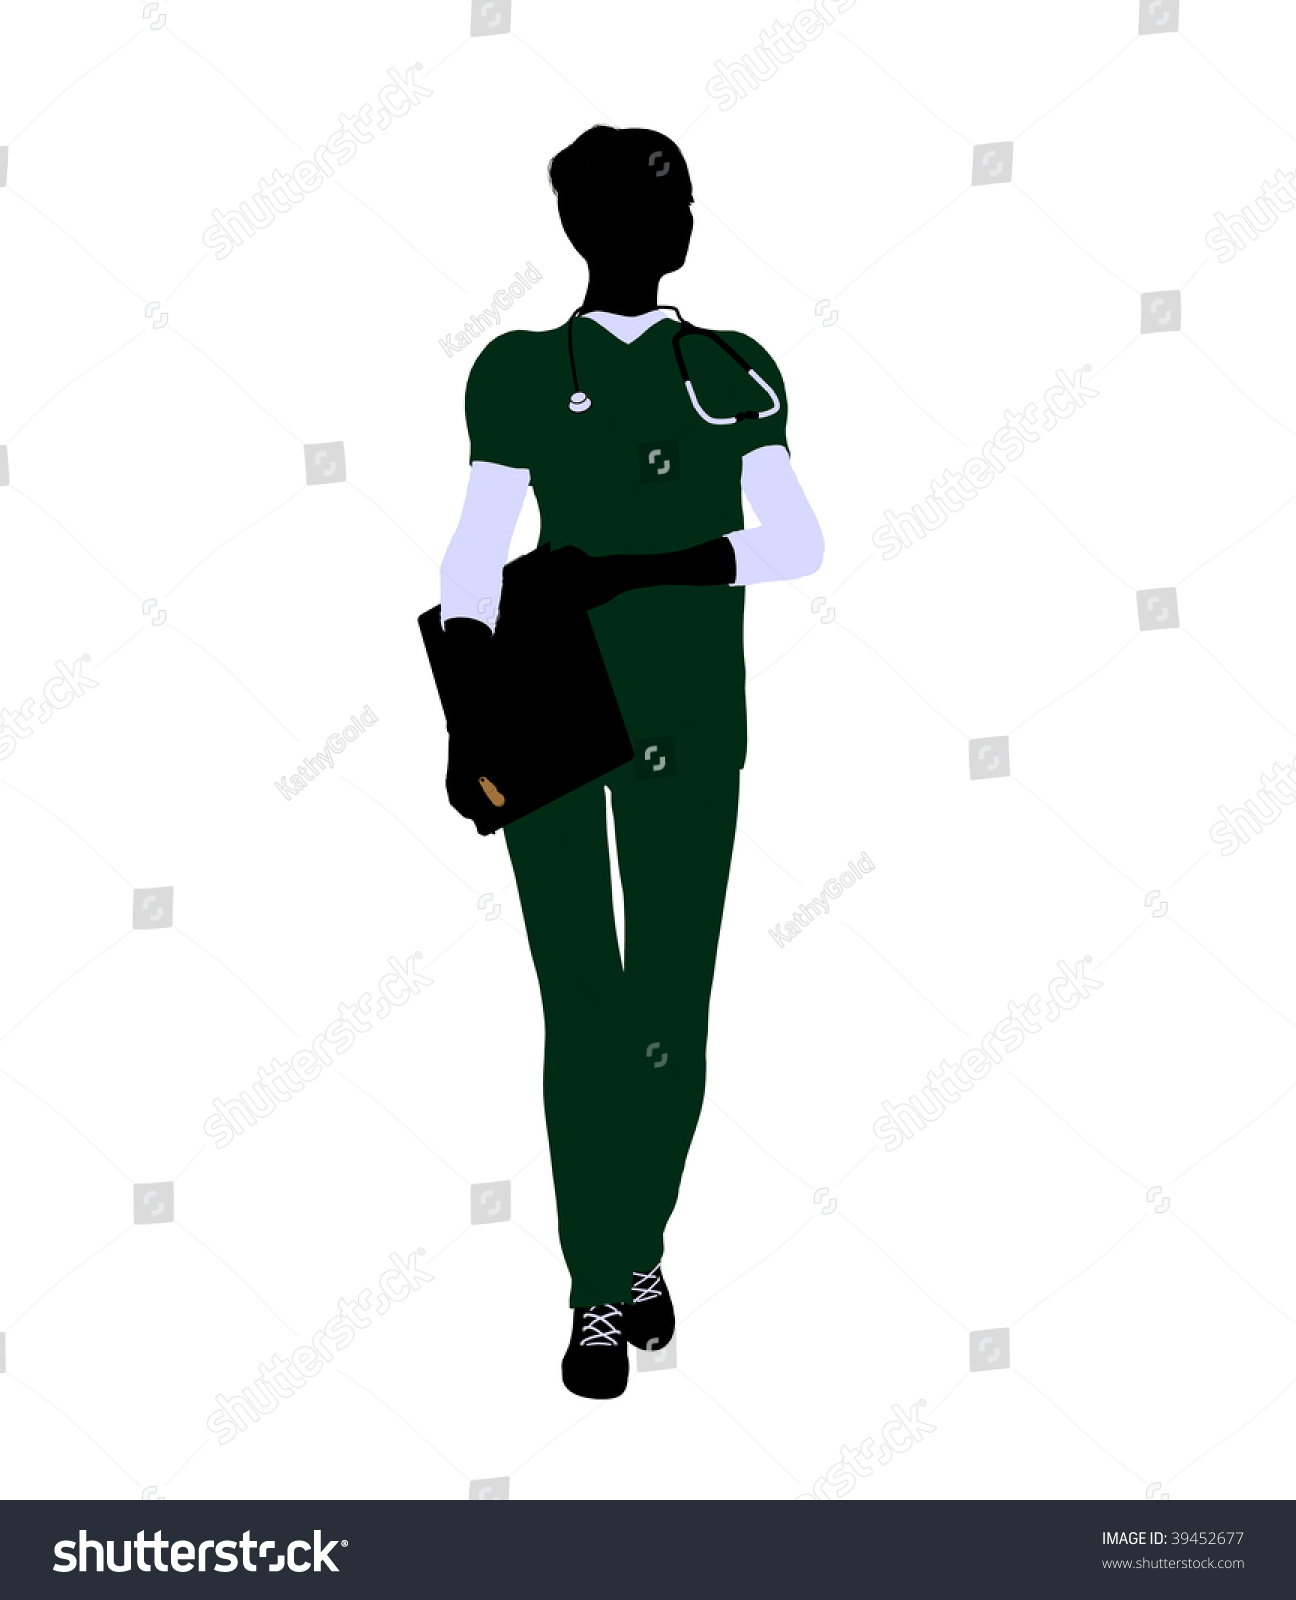 Female Doctor Art Illustration Silhouette On A White ...